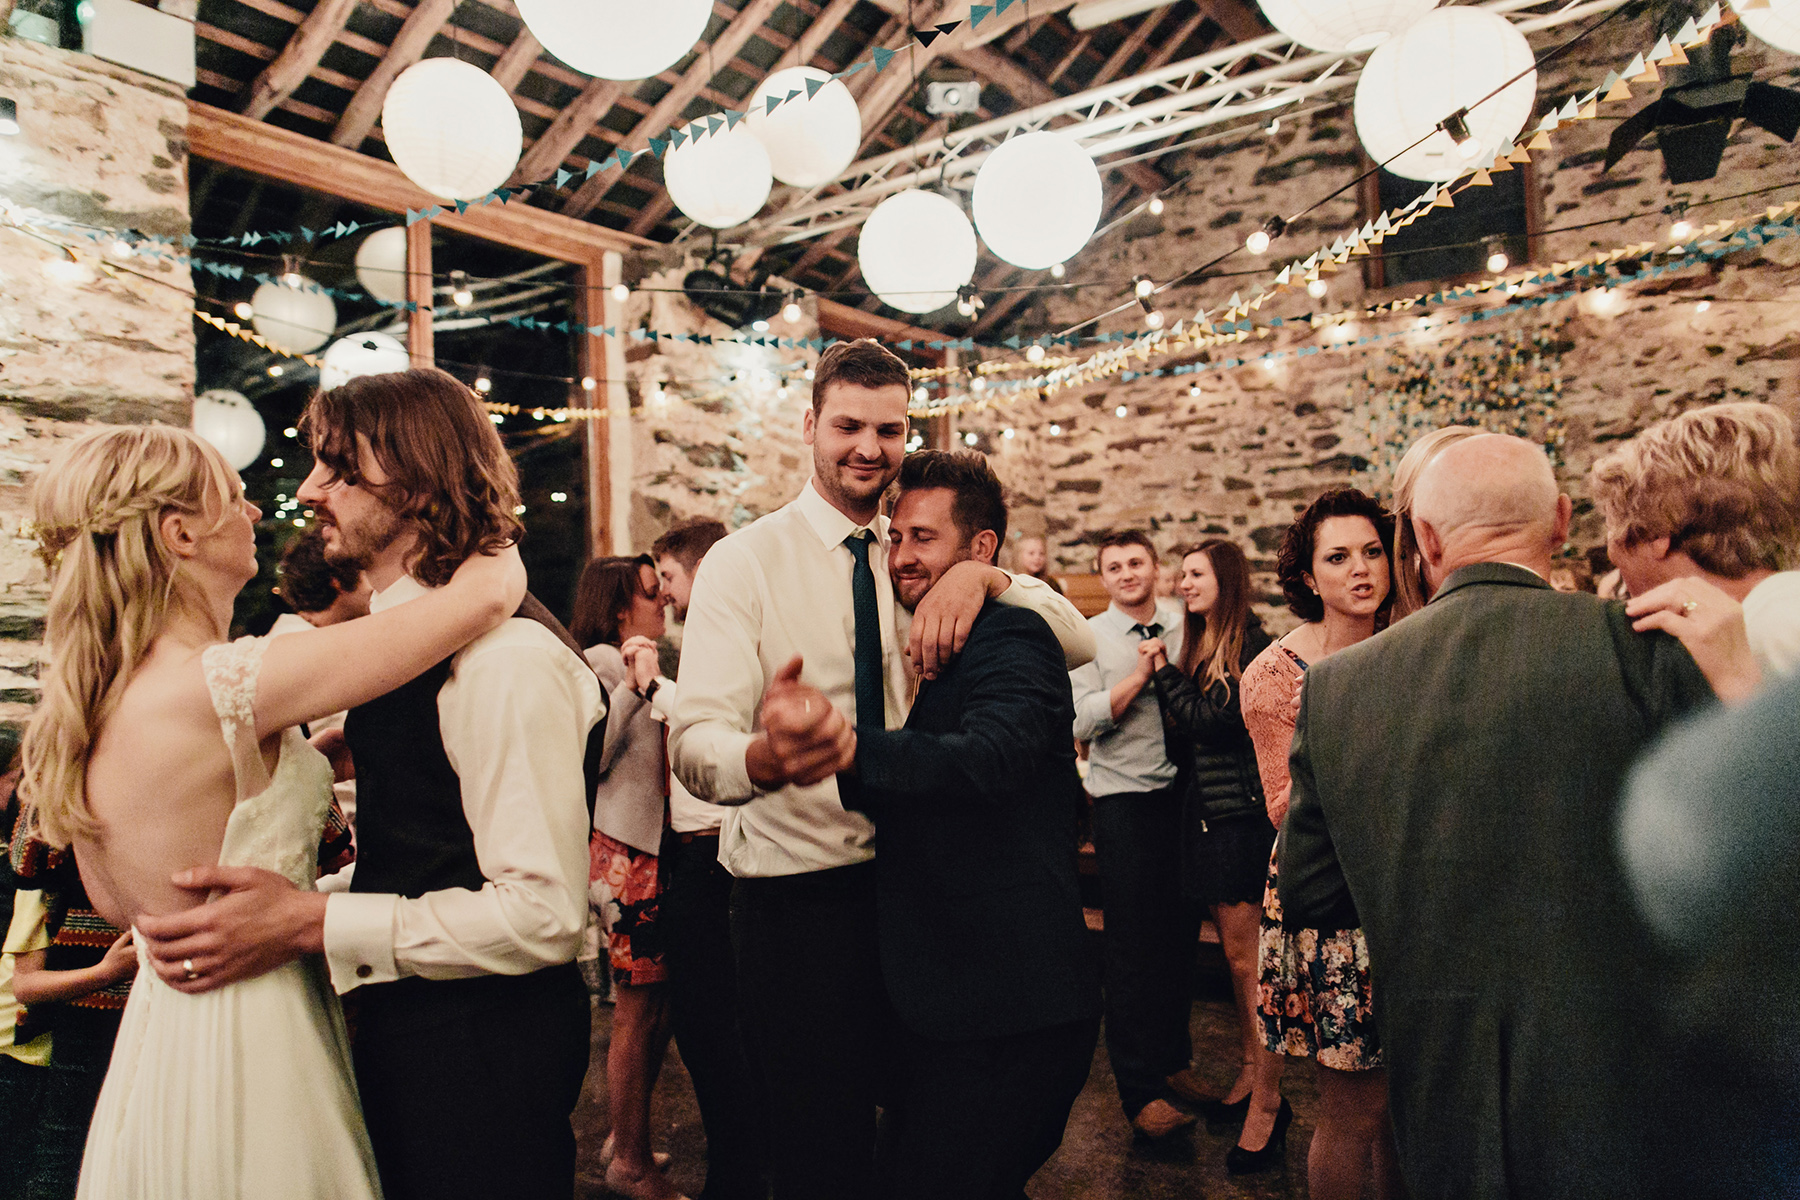 Snowdonia-Wales-Wedding-Photos-0405.jpg